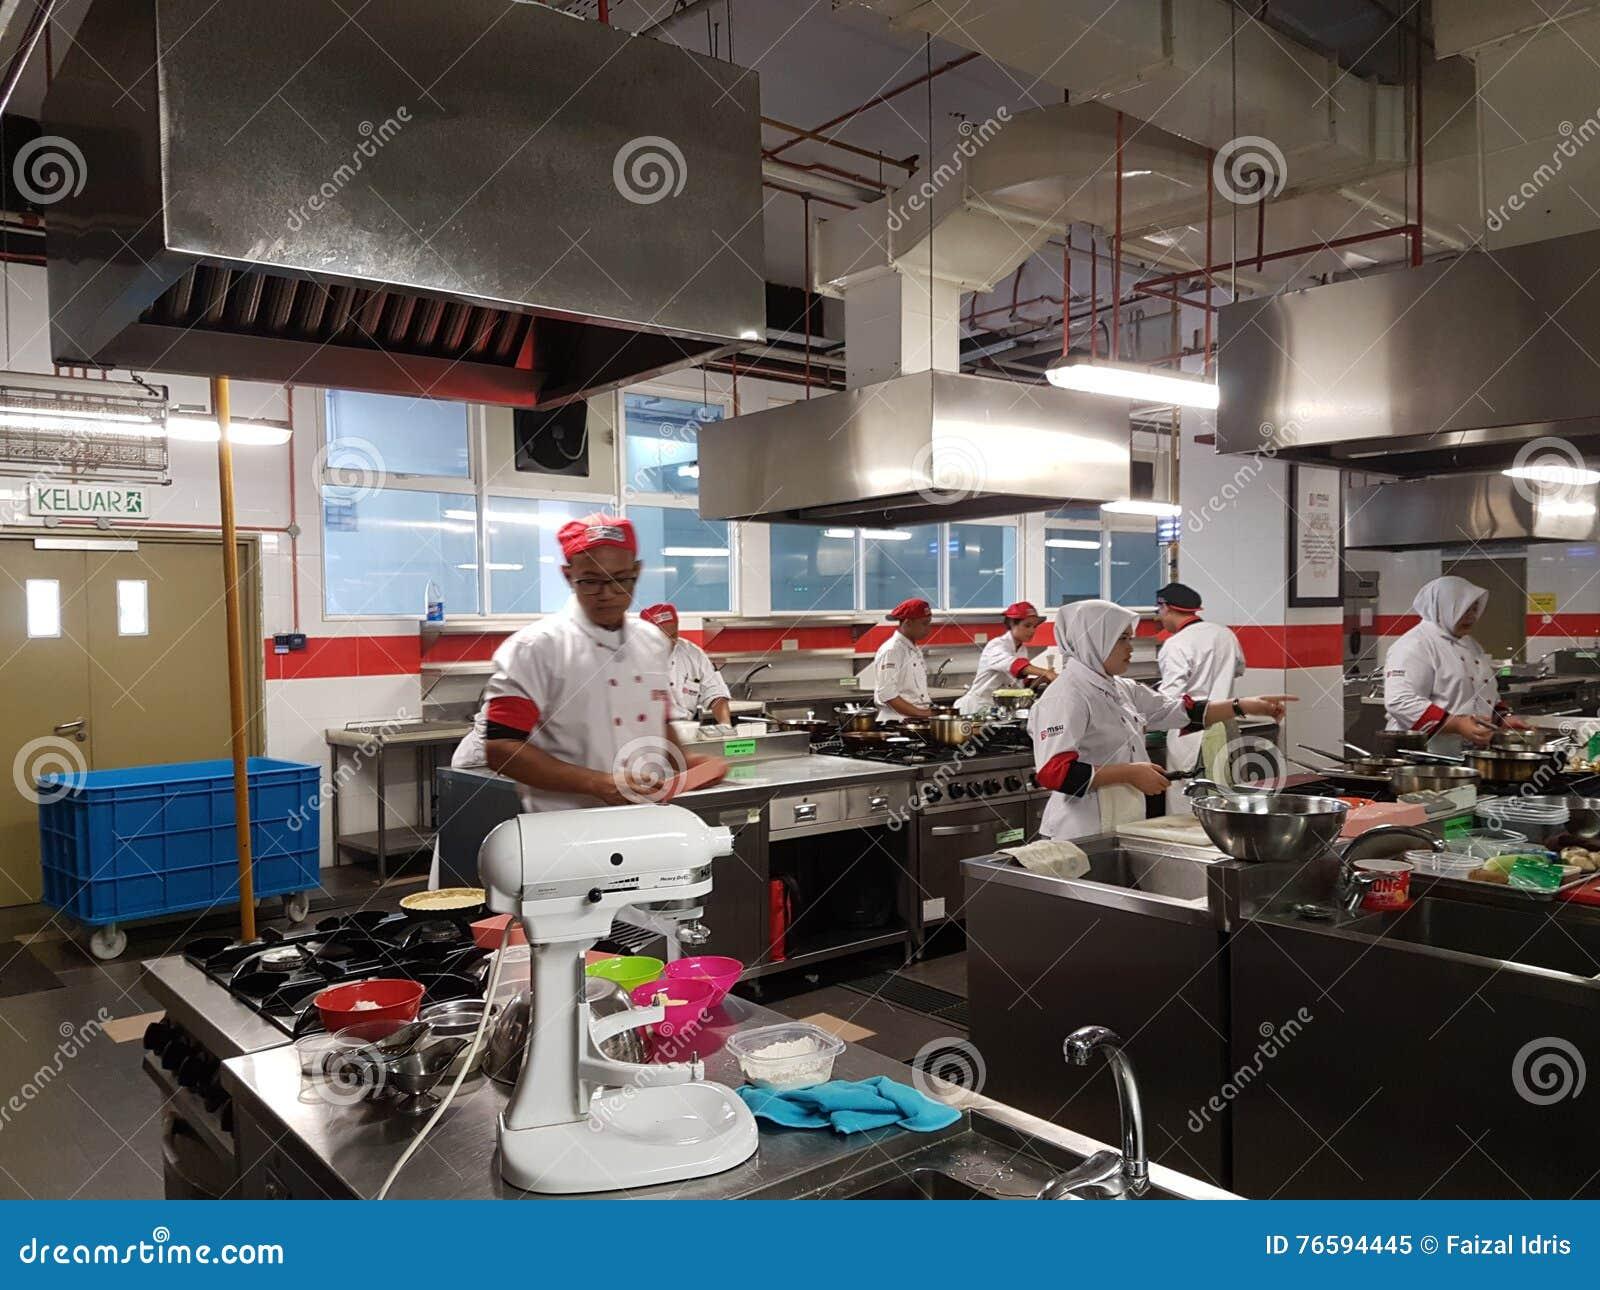 1st Sept 2016, Shah Alam Ungkarl av den kulinariska Art Student praktiska perioden